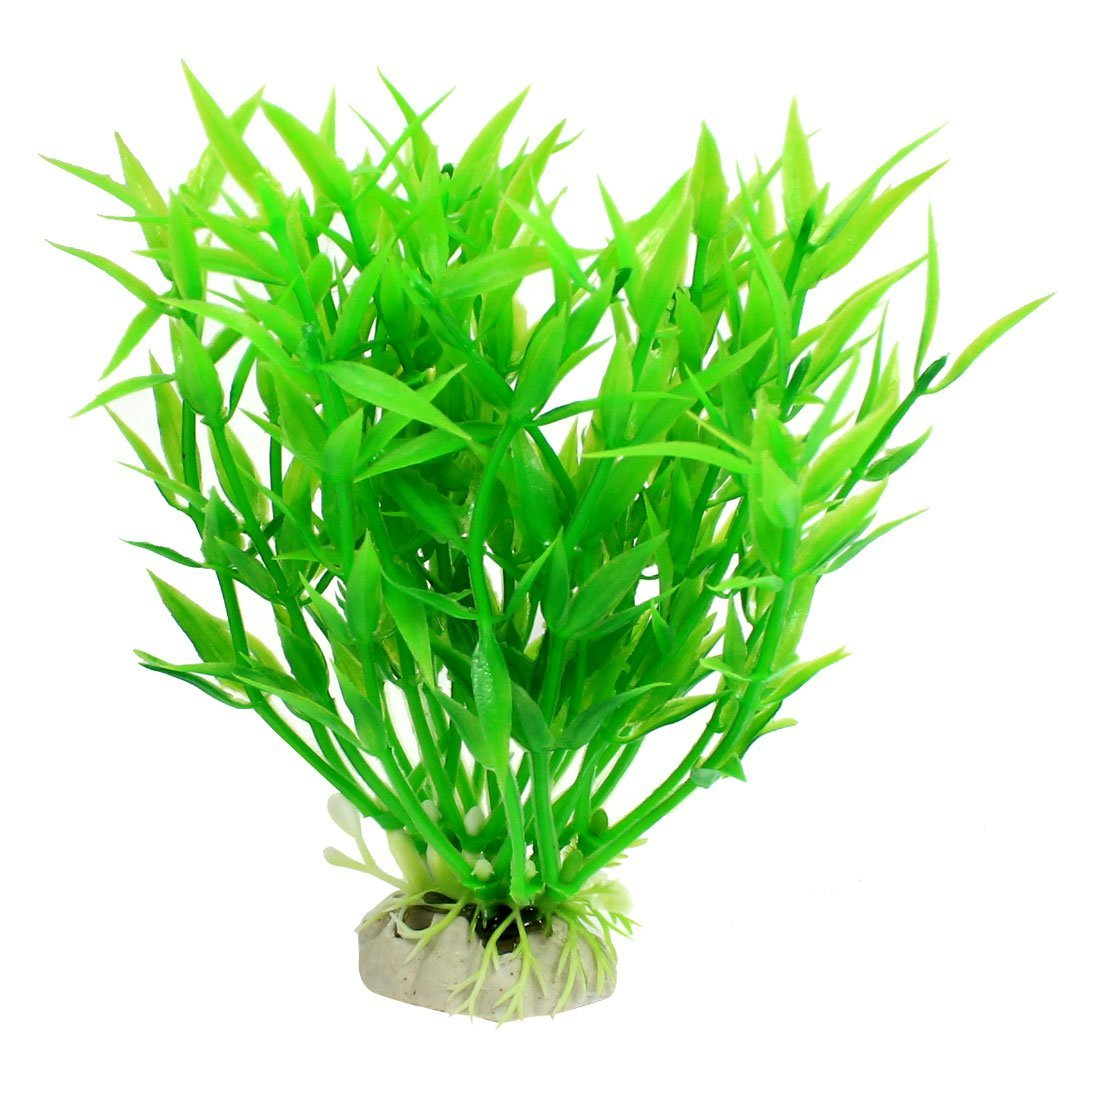 Vert plastique landscaping plante aquatique pour aquarium for Vert plante